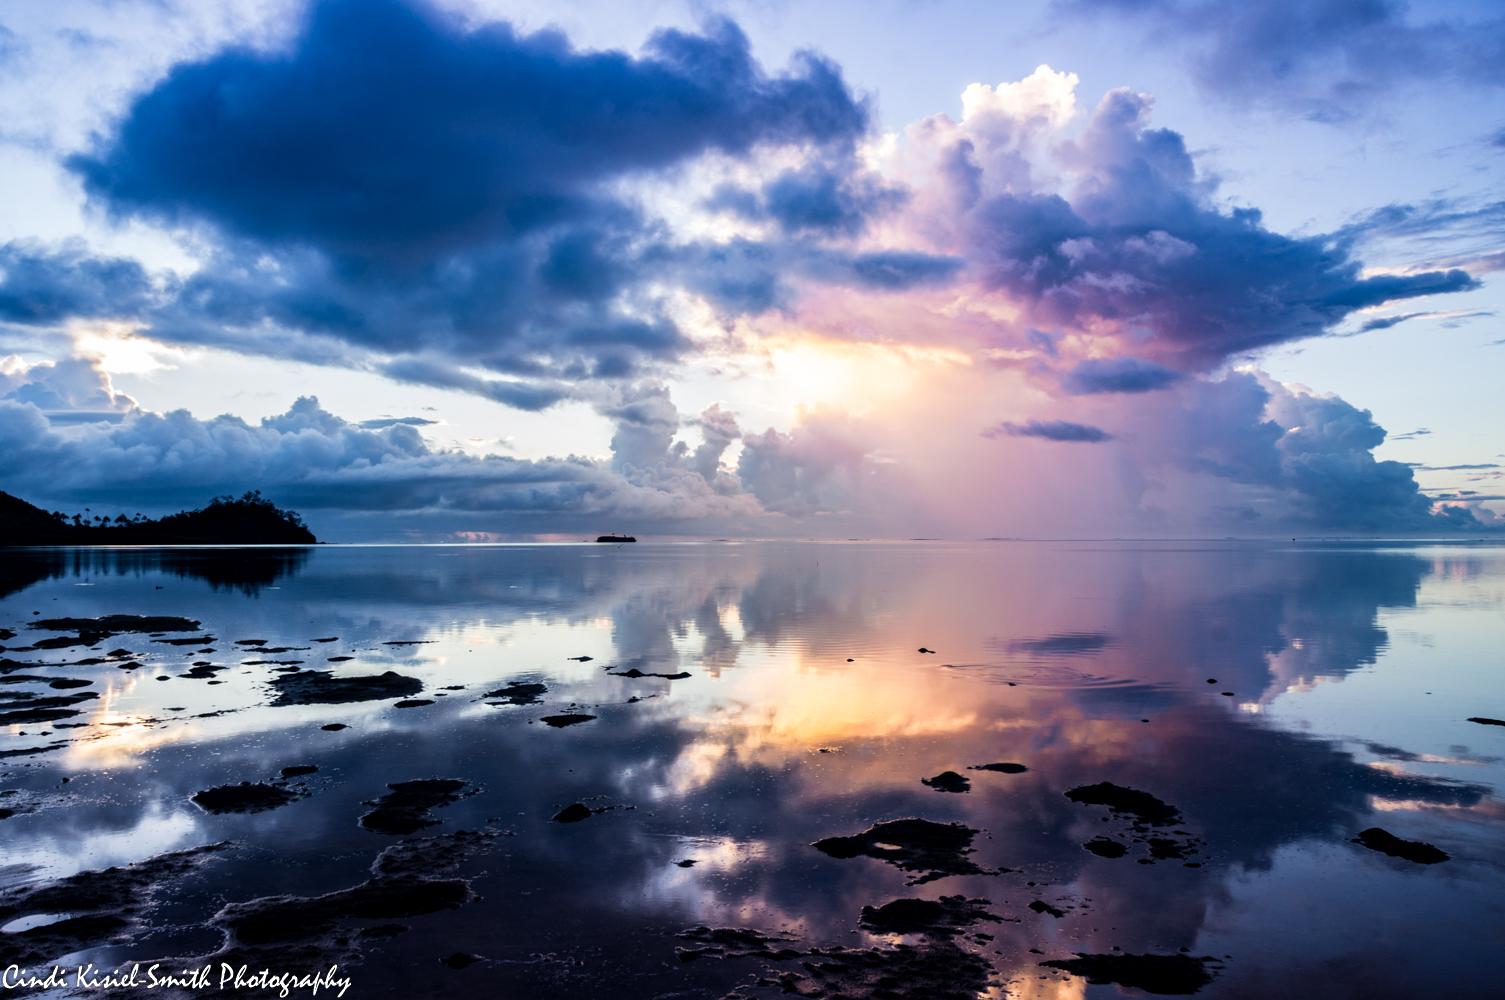 Sunrise Matava Resort Lagoon, Fiji